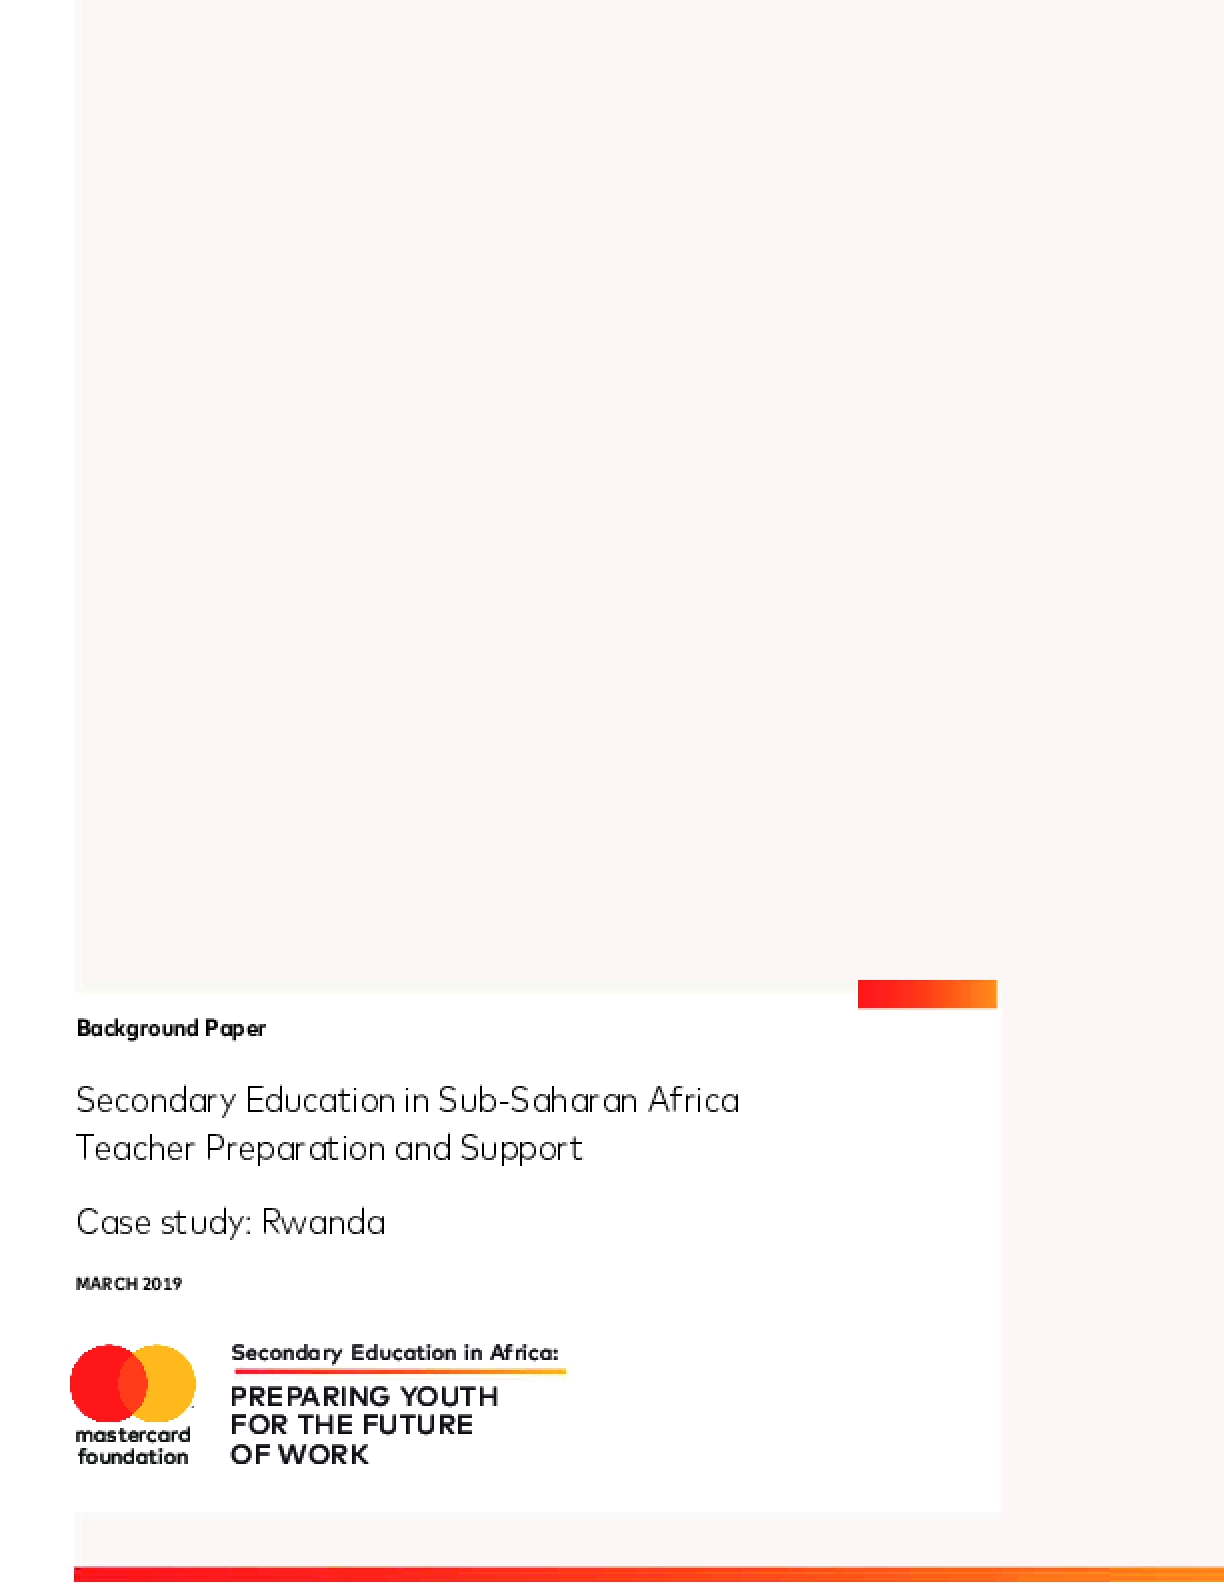 Secondary Education in Sub-Saharan Africa Teacher Preparation Deployment and Support Case Study Rwanda